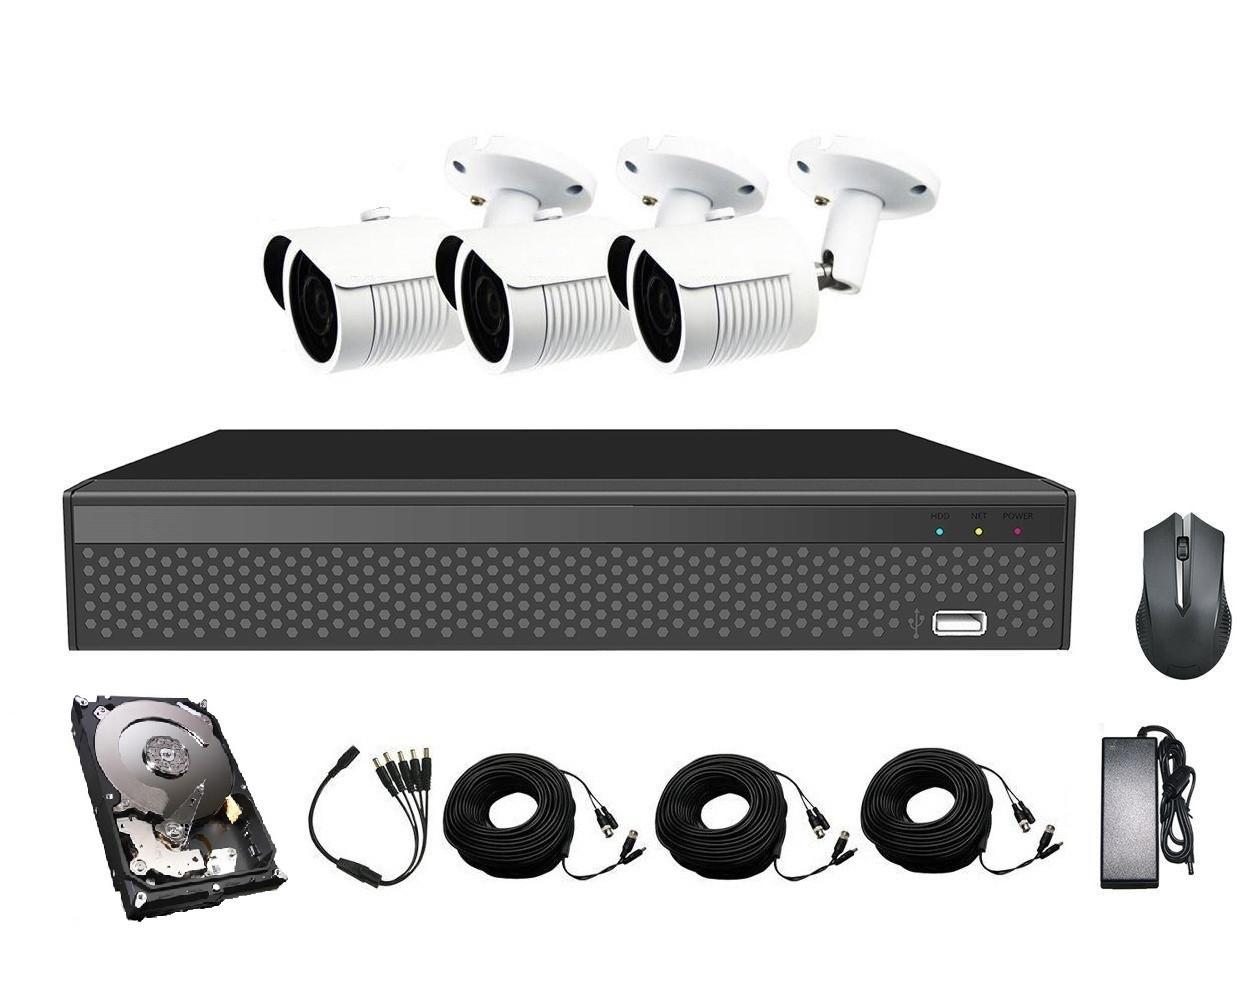 Комплект видеонаблюдения CoVi Security AHD-3W 5MP MasterKit + HDD500